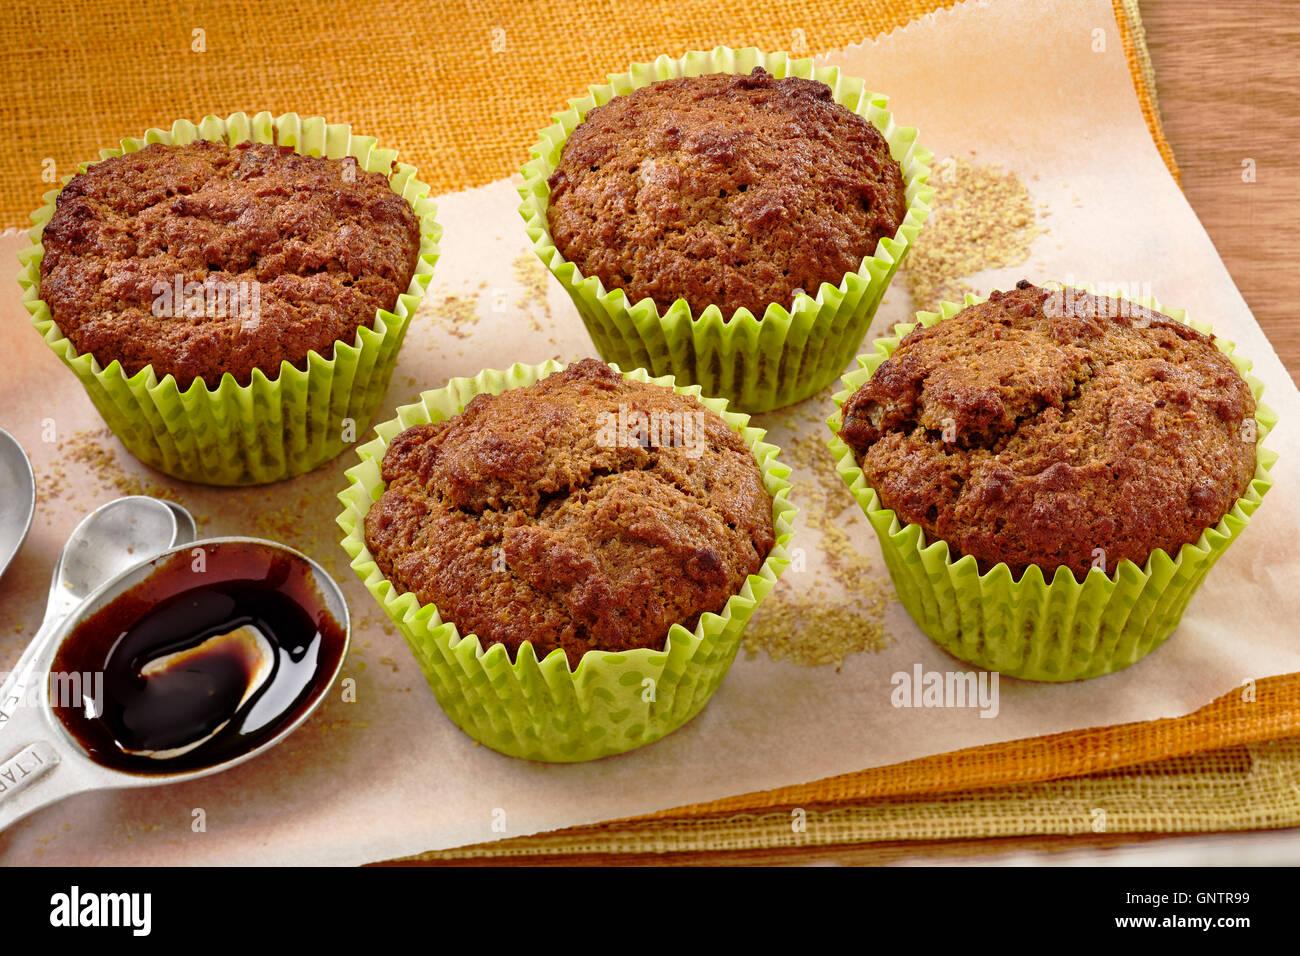 Bran date muffins - Stock Image